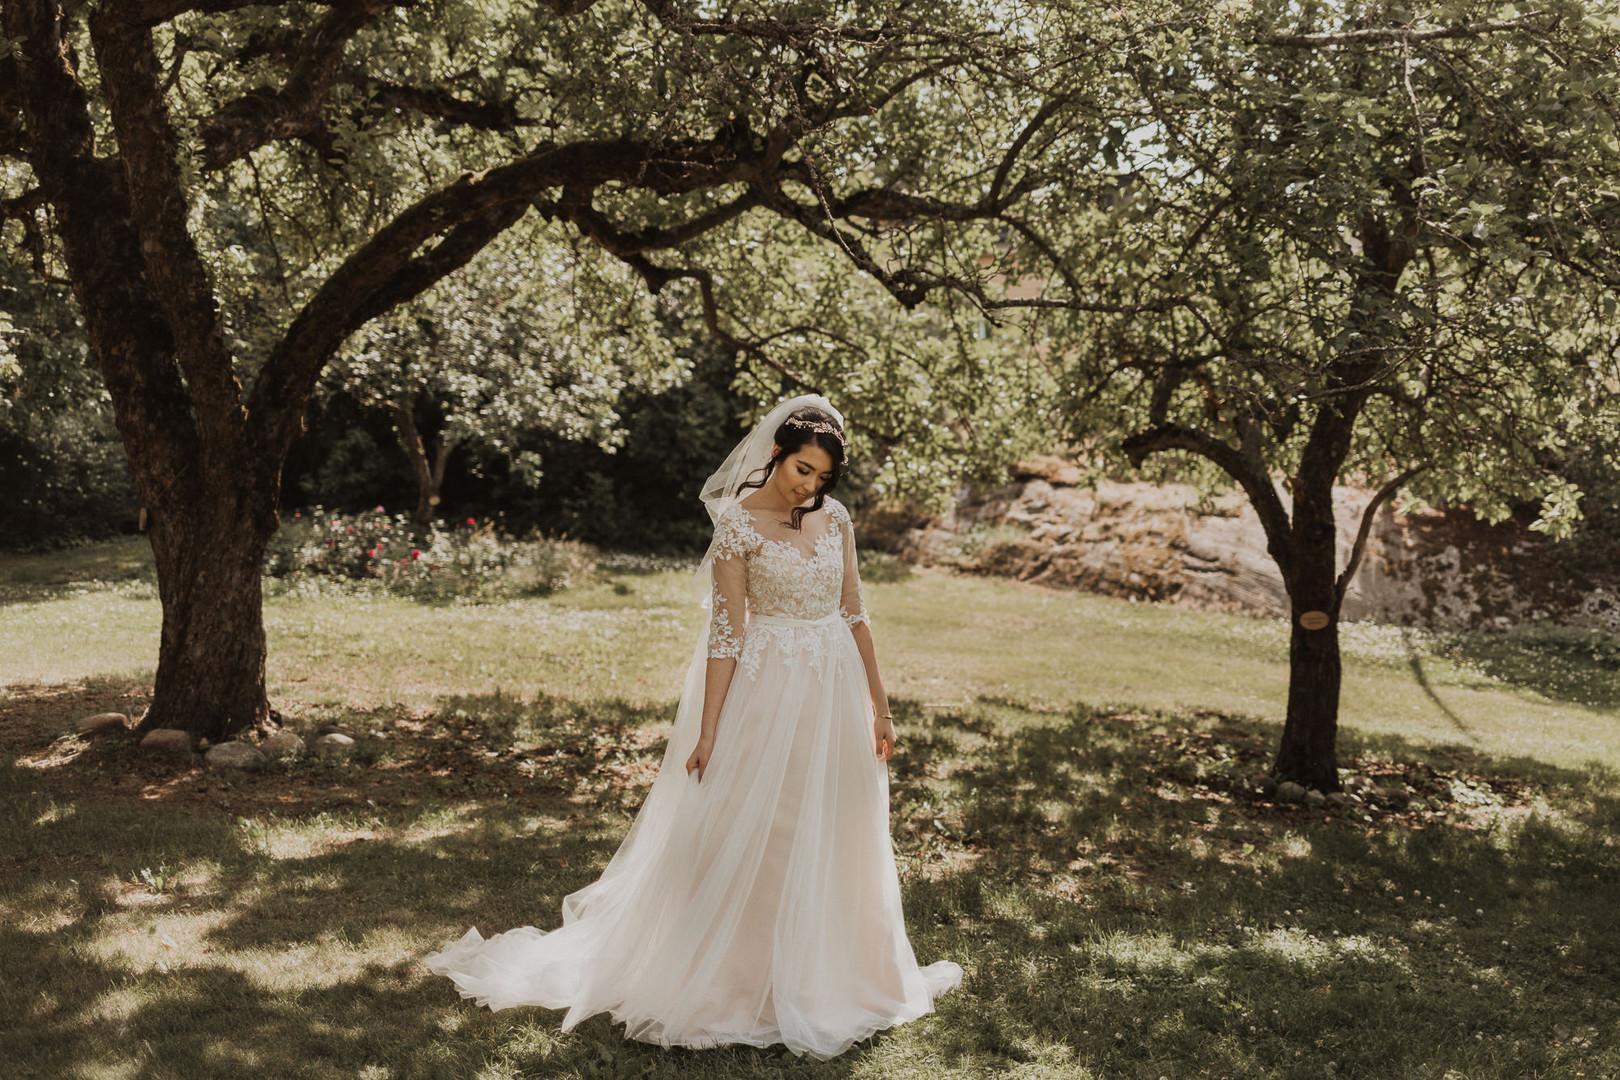 Bröllop vid Cedergrenska tornet